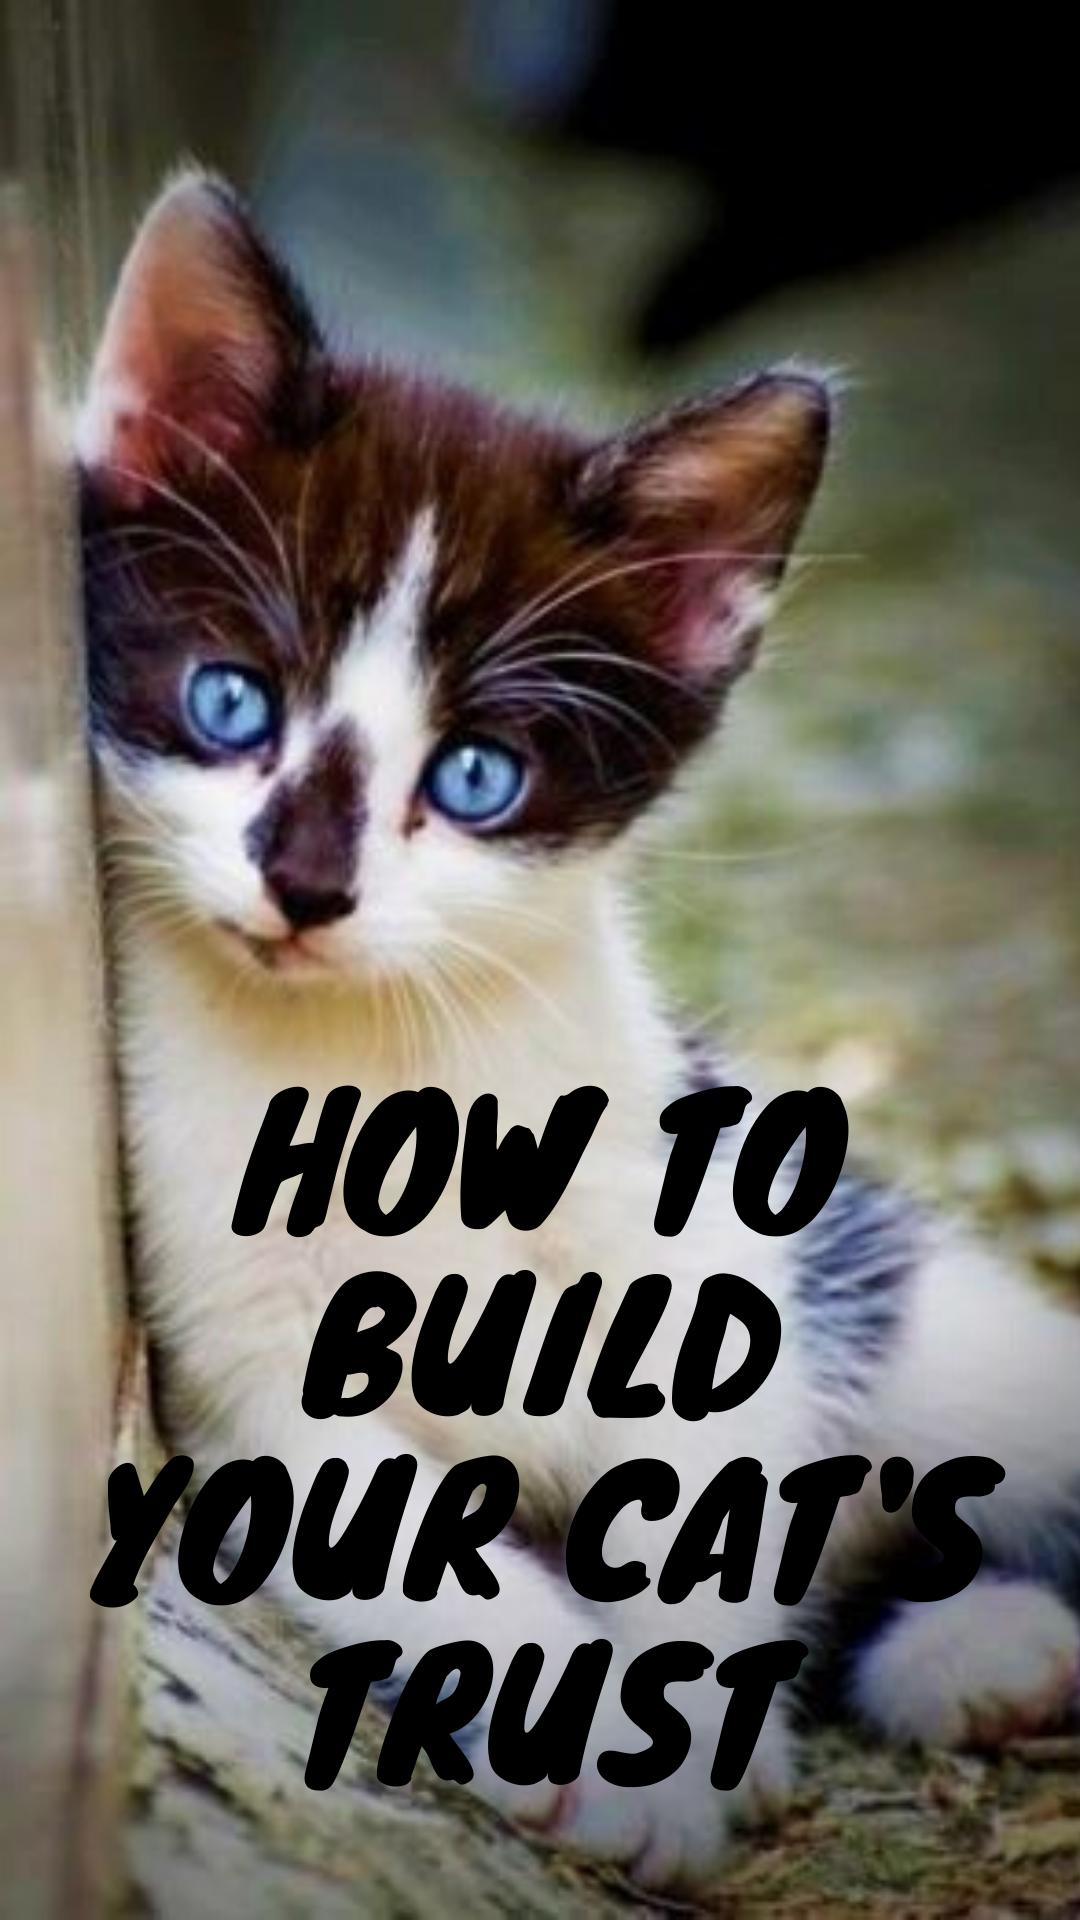 285800912bdb5a13fe08575738f2d696 - How To Get A Wild Kitten To Trust You